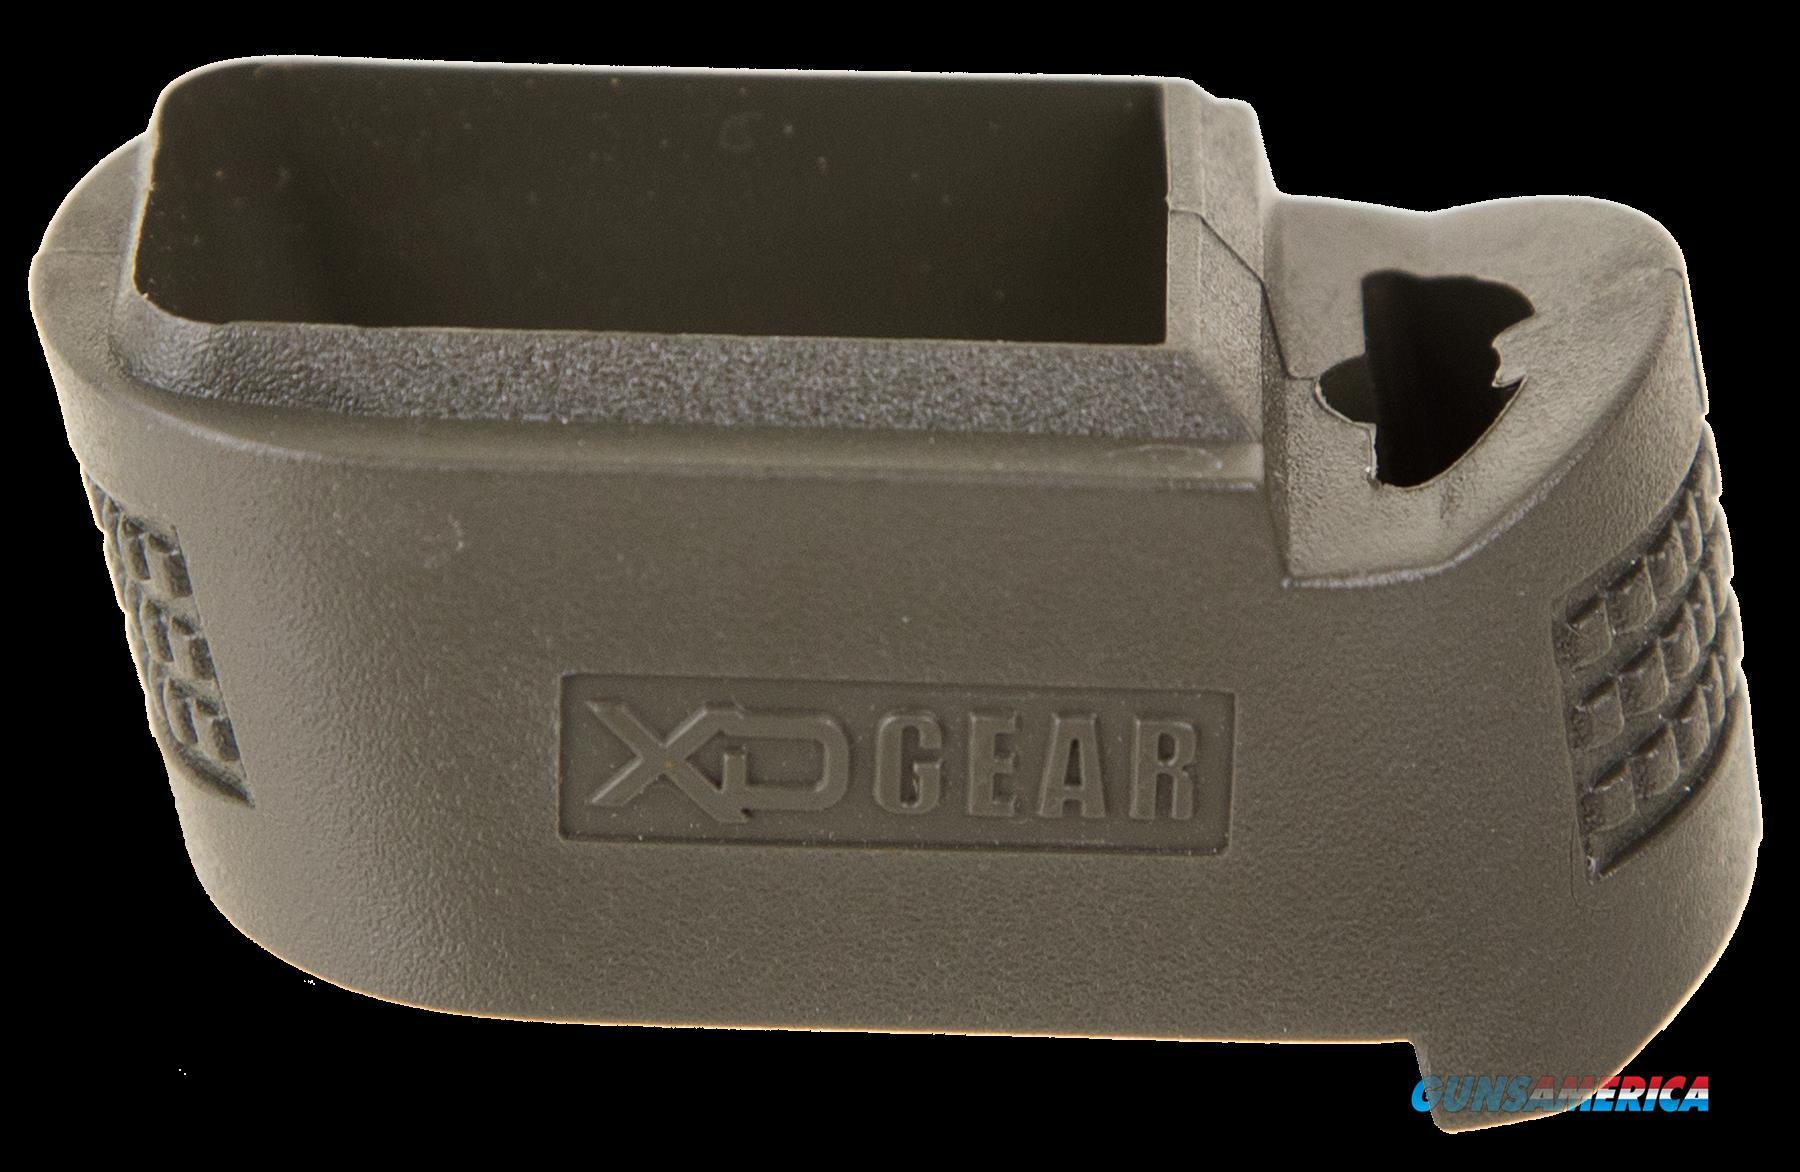 Springfield Armory Xd, Spg Xd5004      Mag Sleeve 9mm-40    Grn  Guns > Pistols > 1911 Pistol Copies (non-Colt)